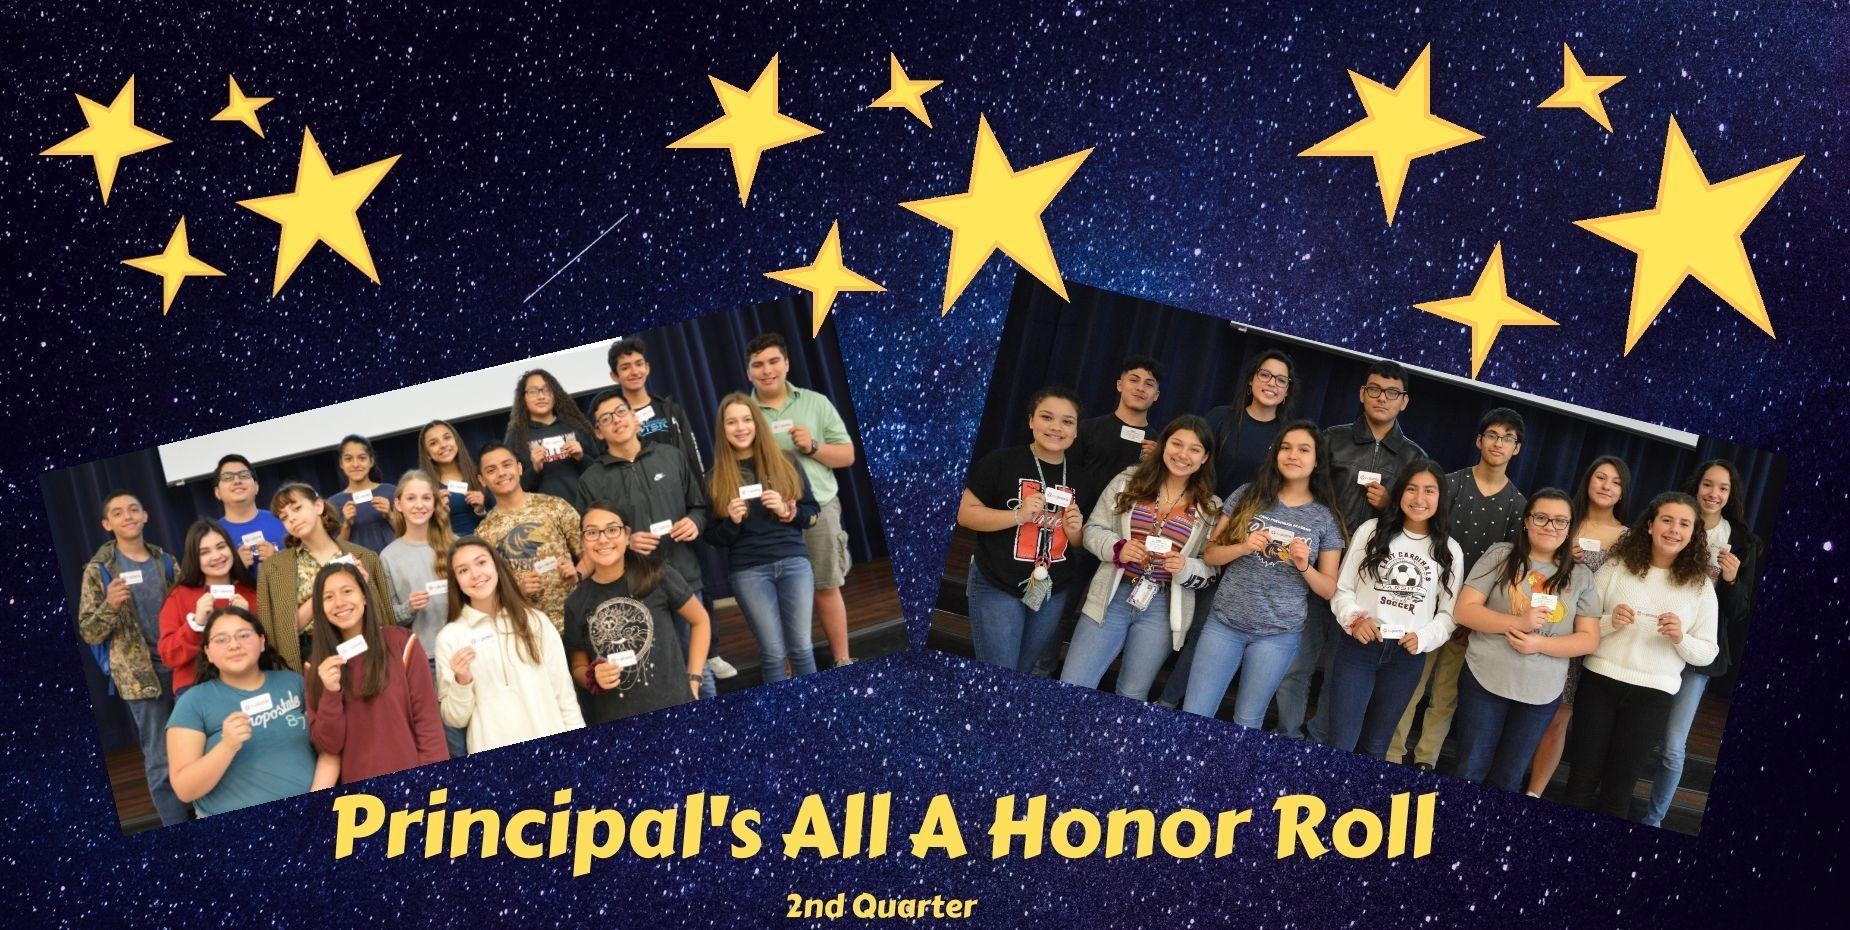 Principal's All A Honor Roll